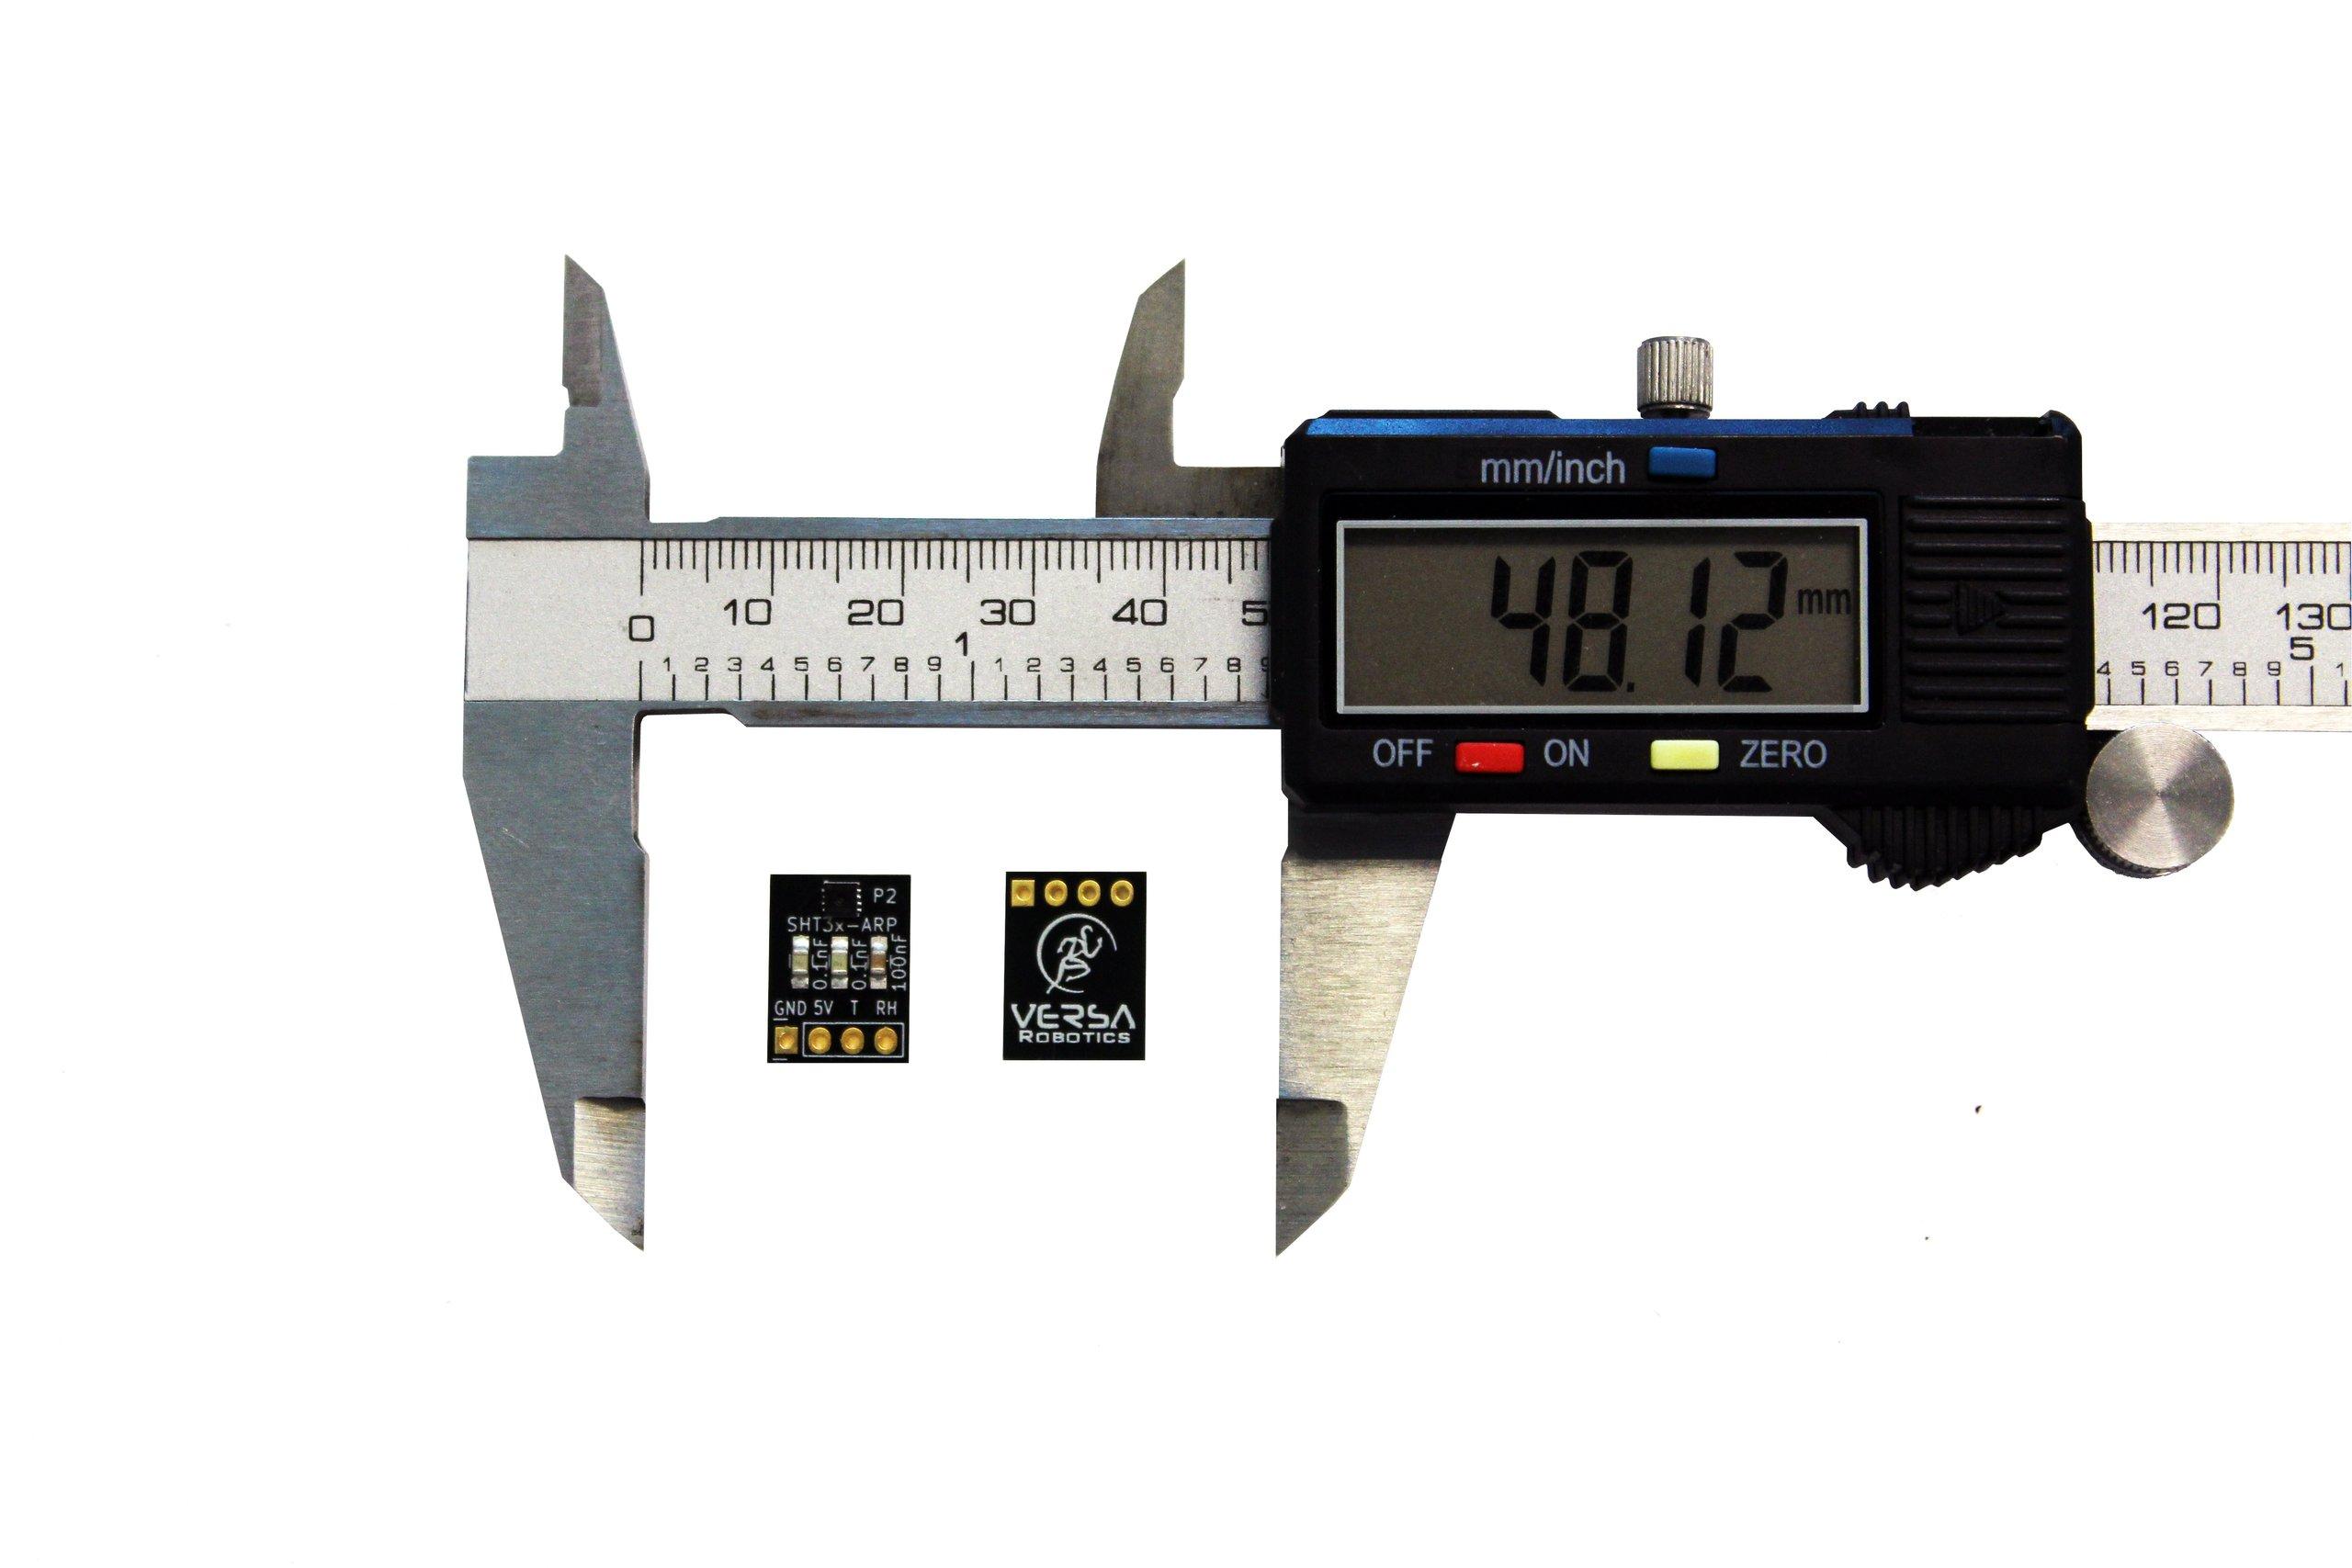 SHT31 ARP B Breakout Analog Humidity/Temp Sensor from VersaRobotics  #2F4569